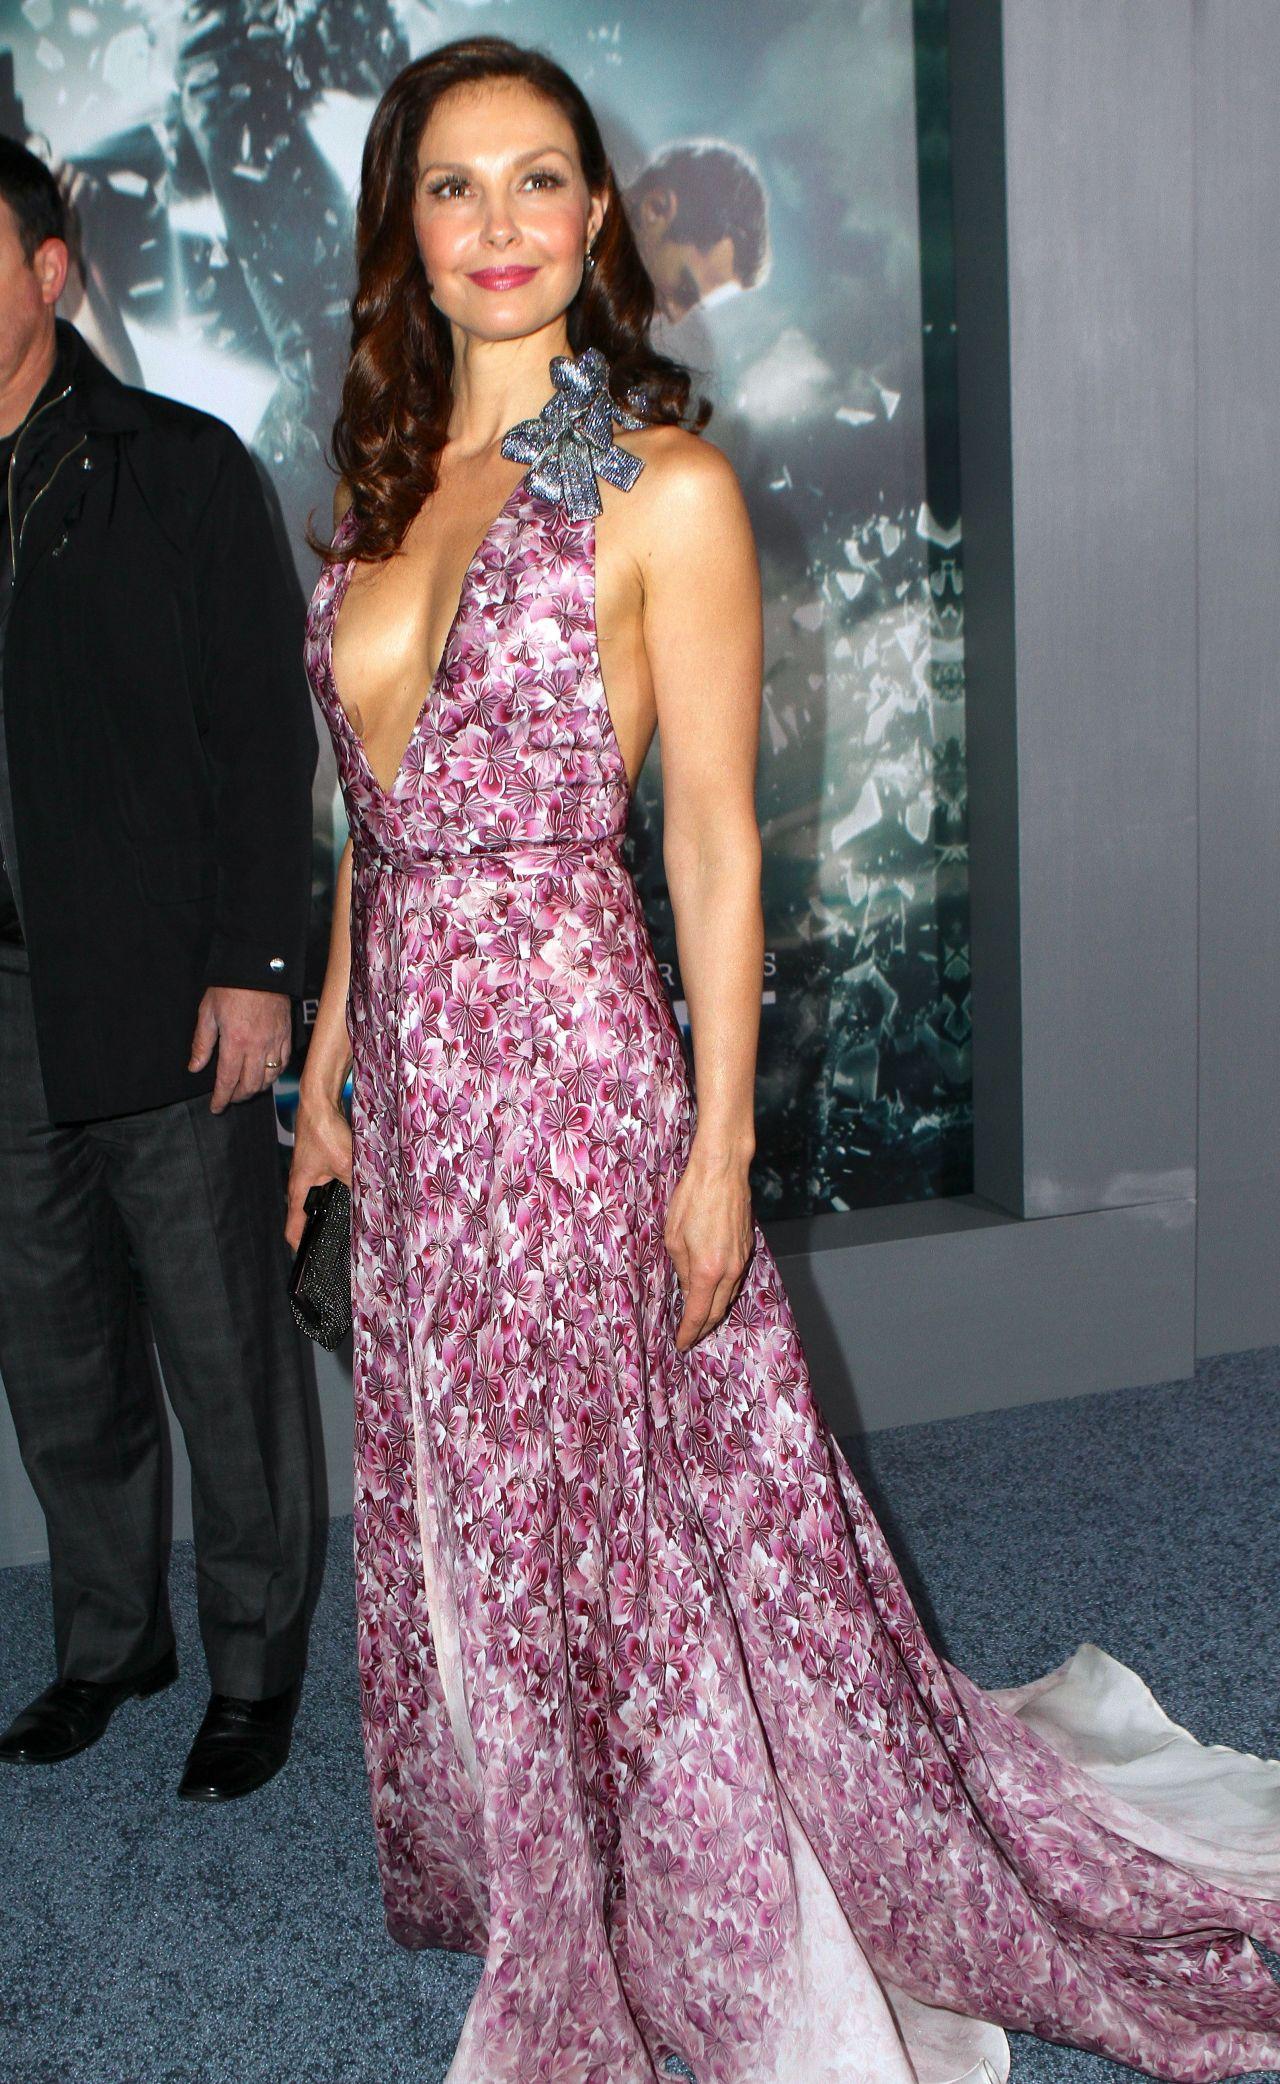 Ashley Judd Insurgent Premiere In New York City